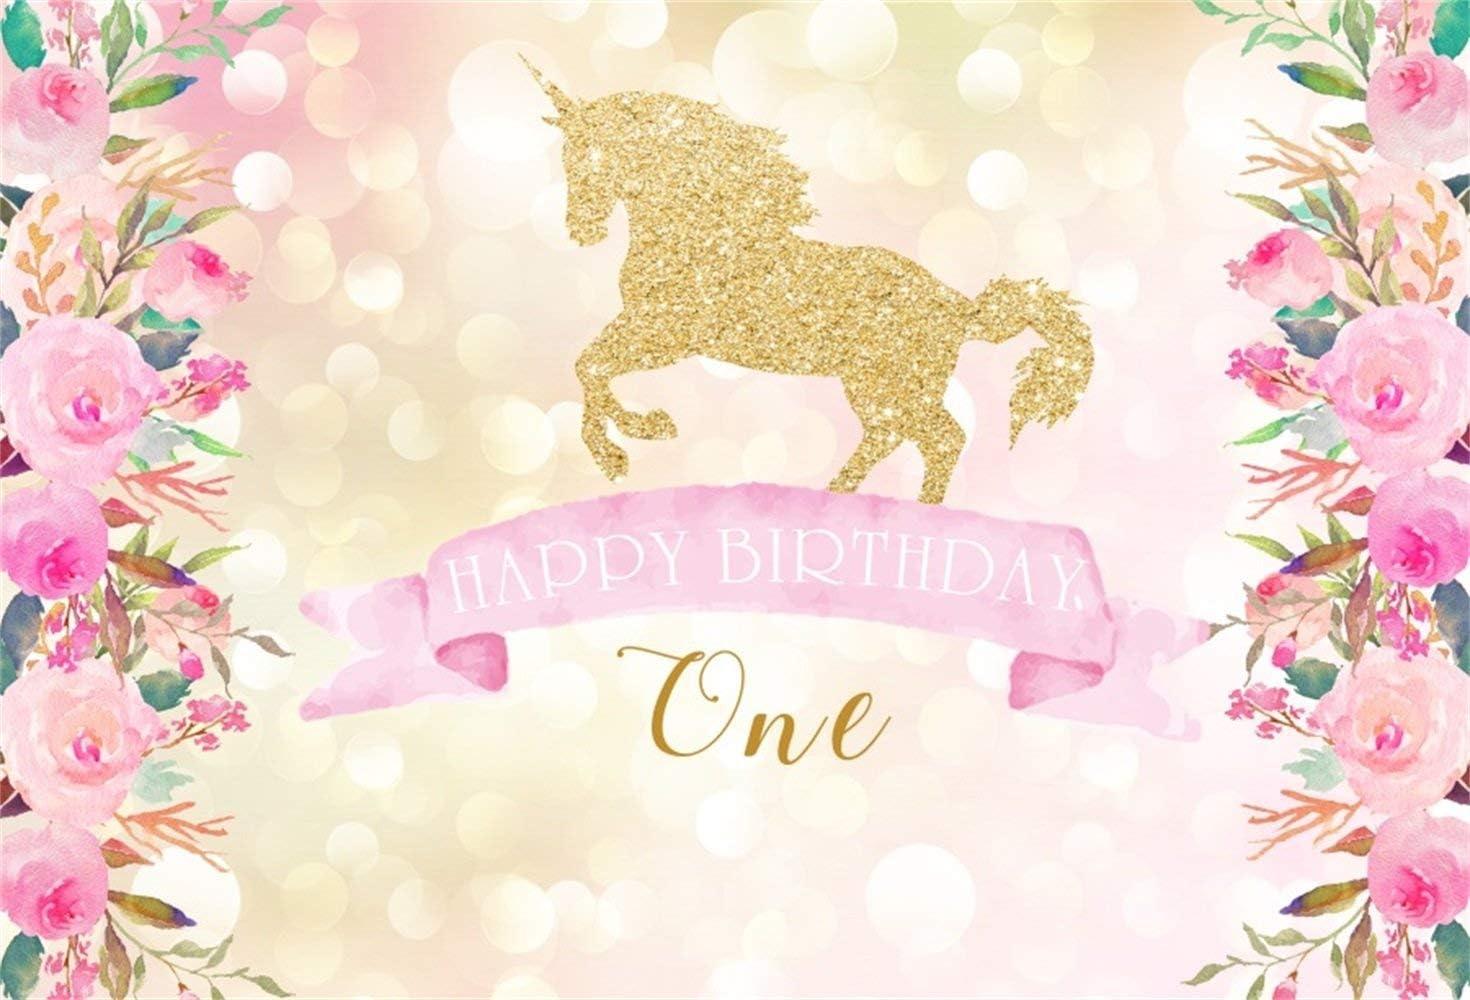 Happy 1st Birthday Unicorn Backdrop 5x3ft Polyester Golden Glitter Unicorn Dreamlike Bokeh Haloes Photography Background Pink Flower Edges Kids Child Baby Shoot Birthday Party Banner Cake Smash